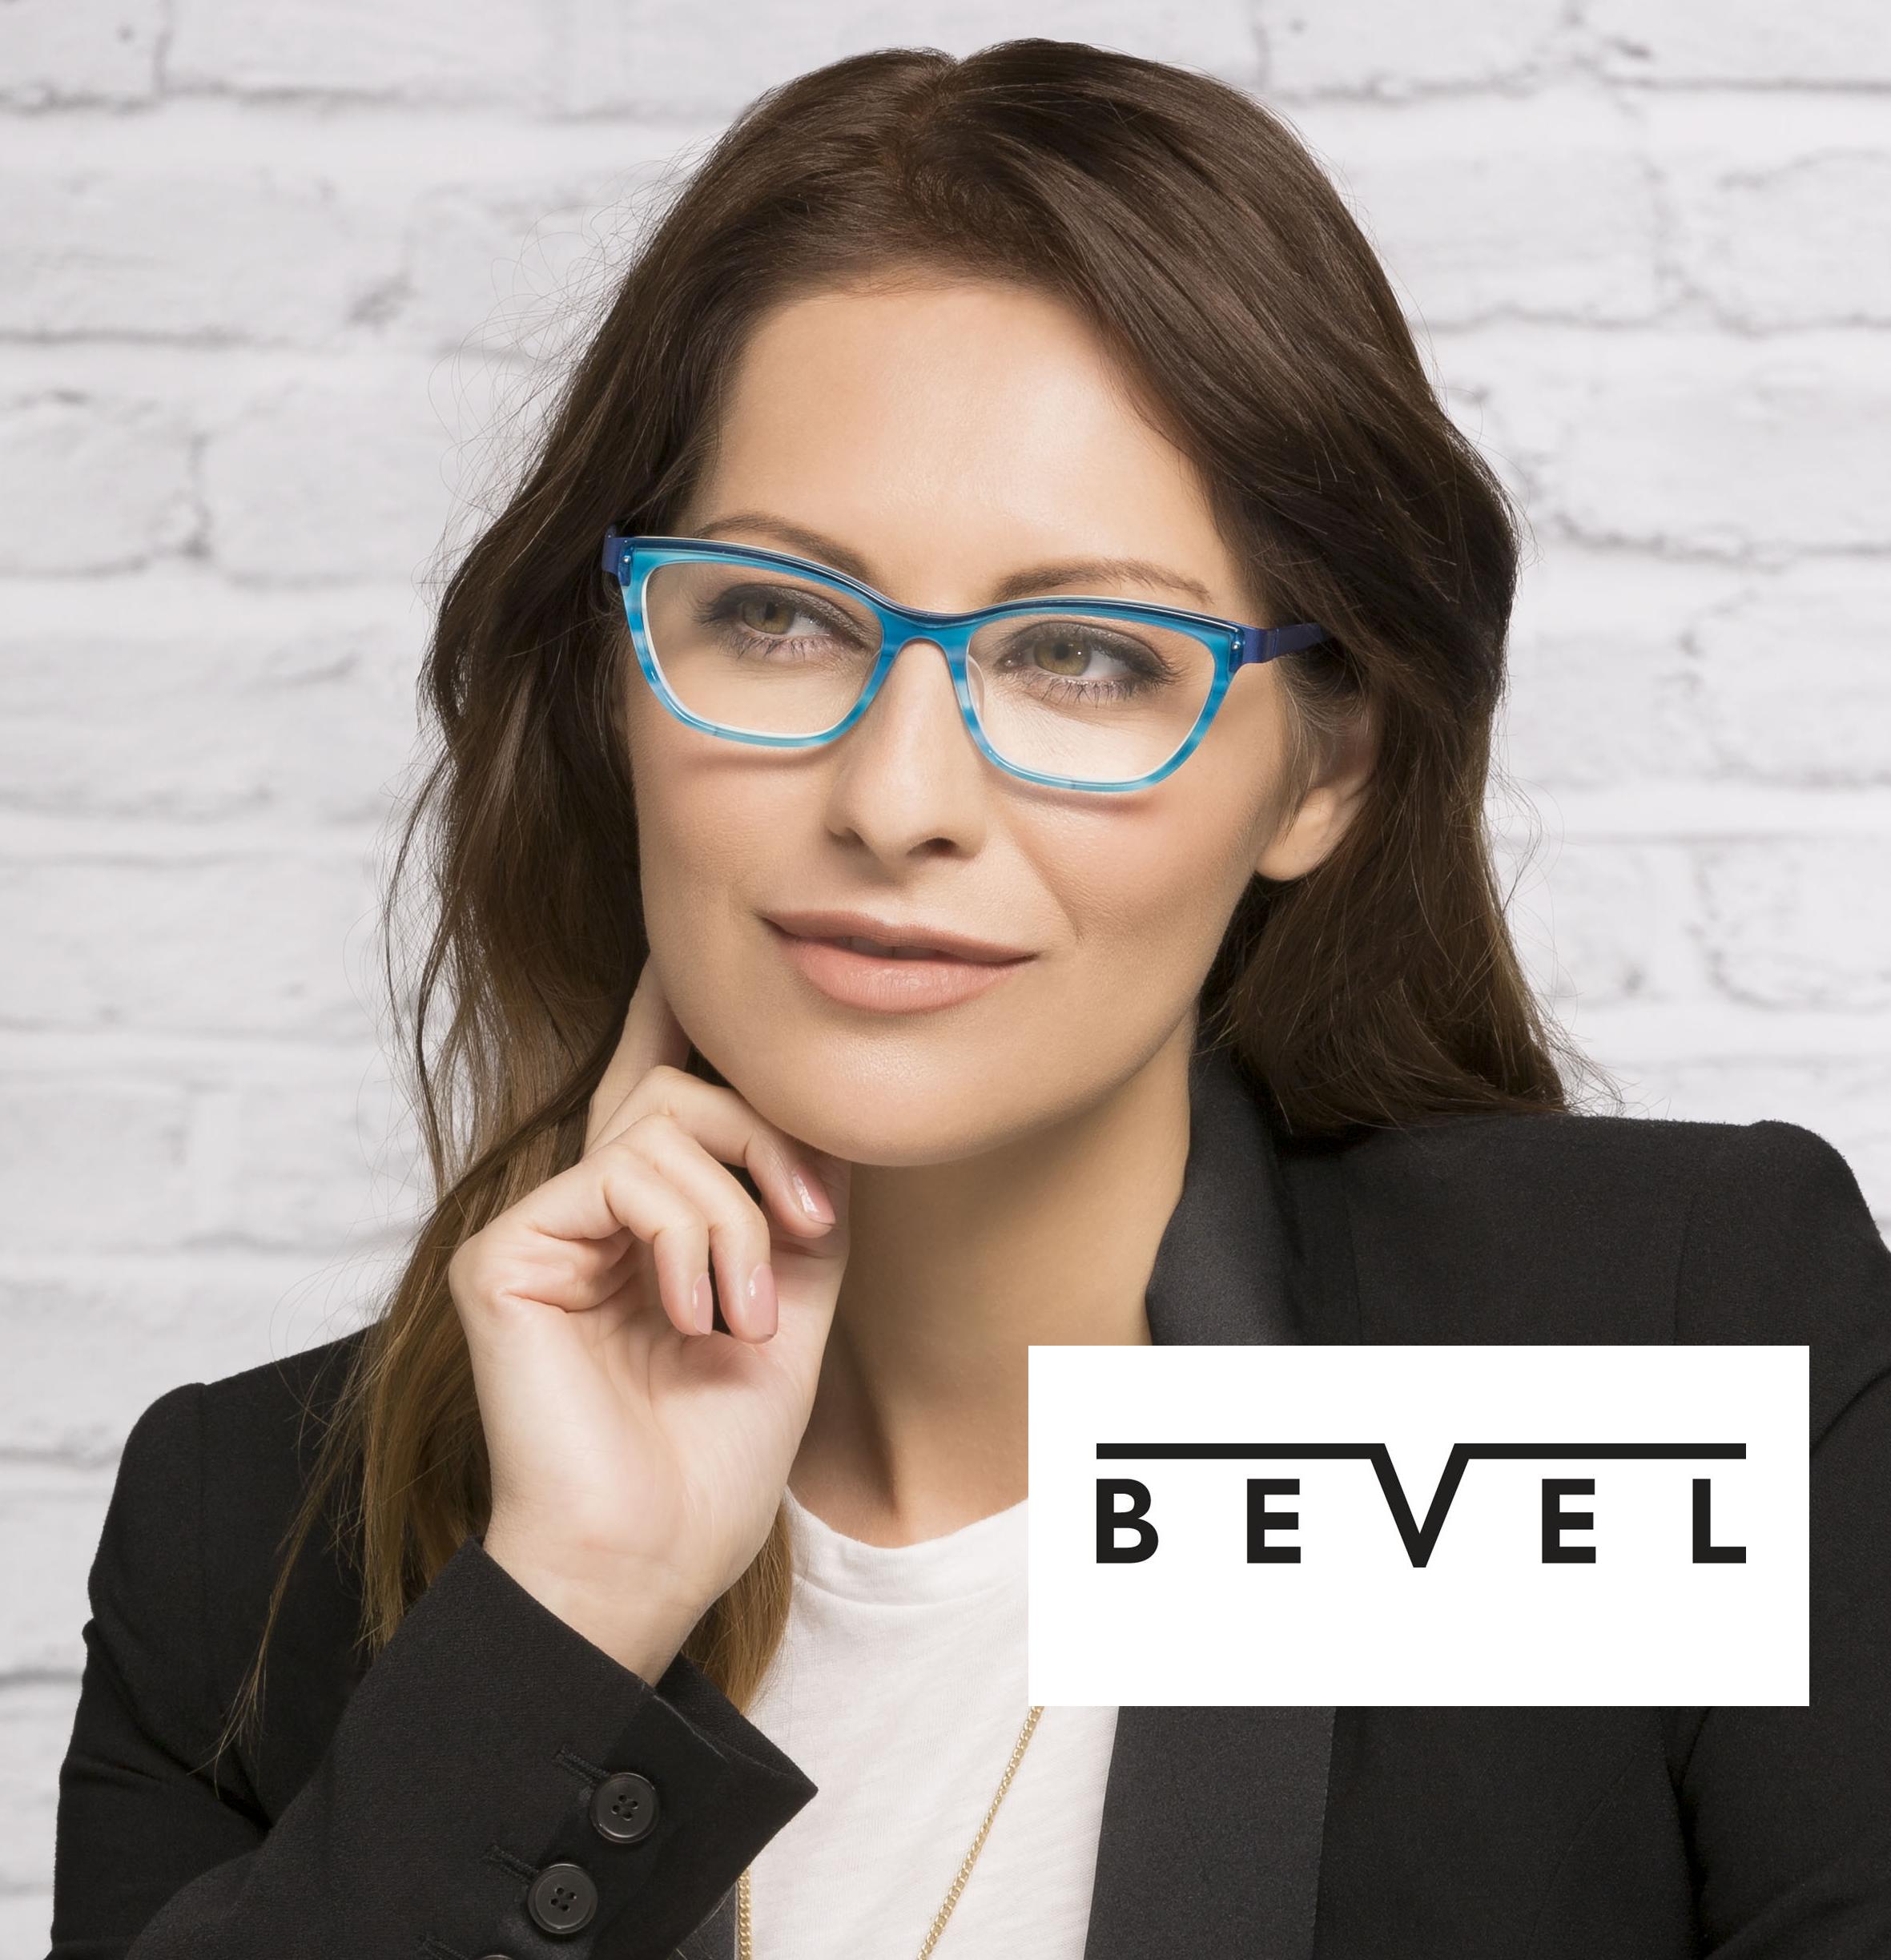 Bevel glasses.png